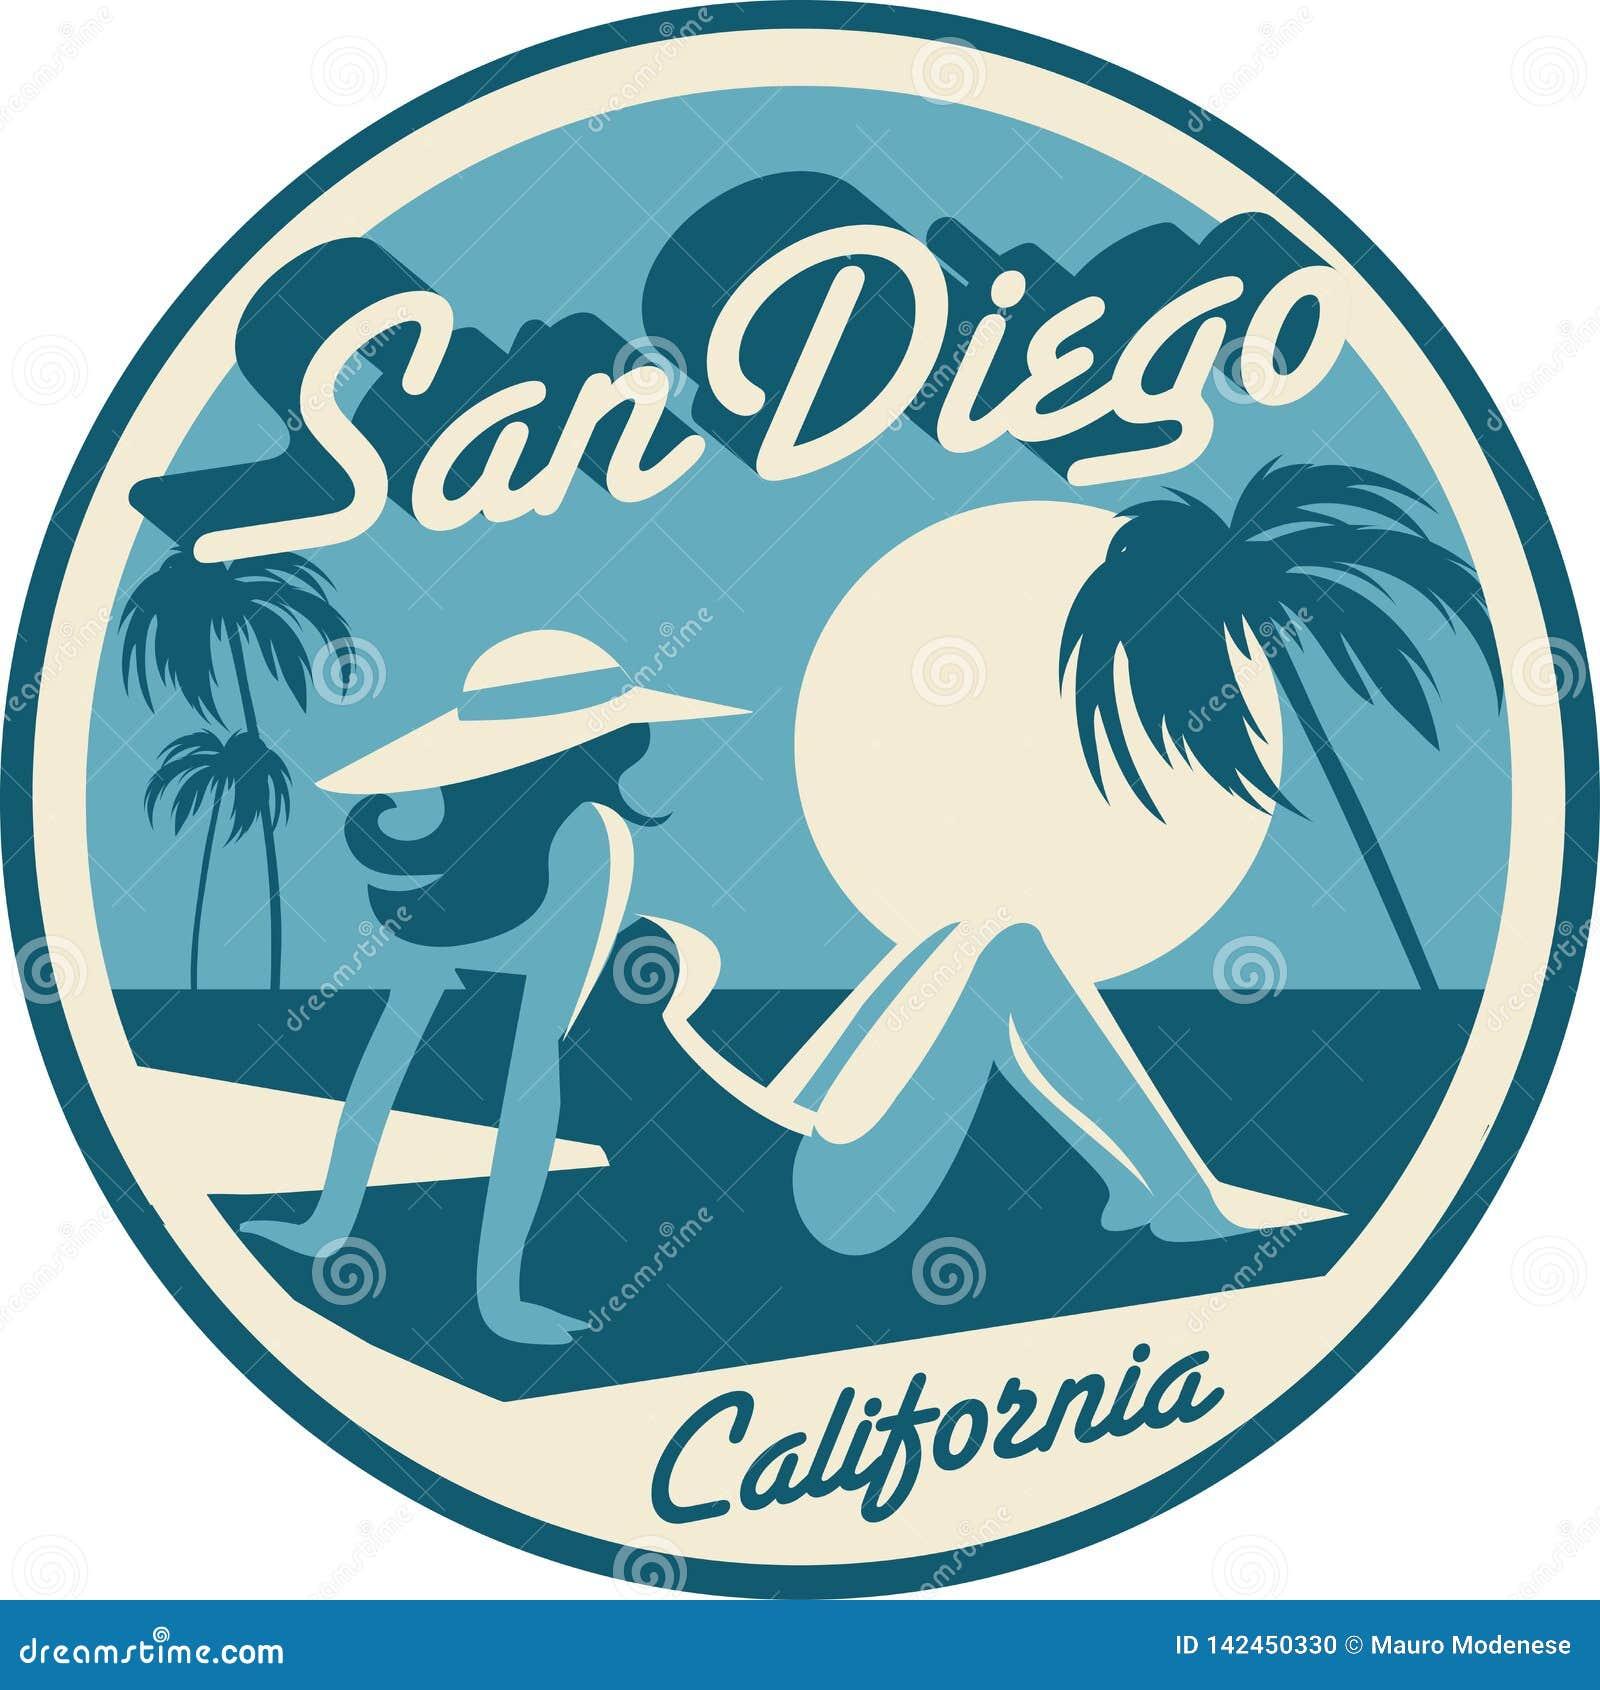 San Diego California postcard